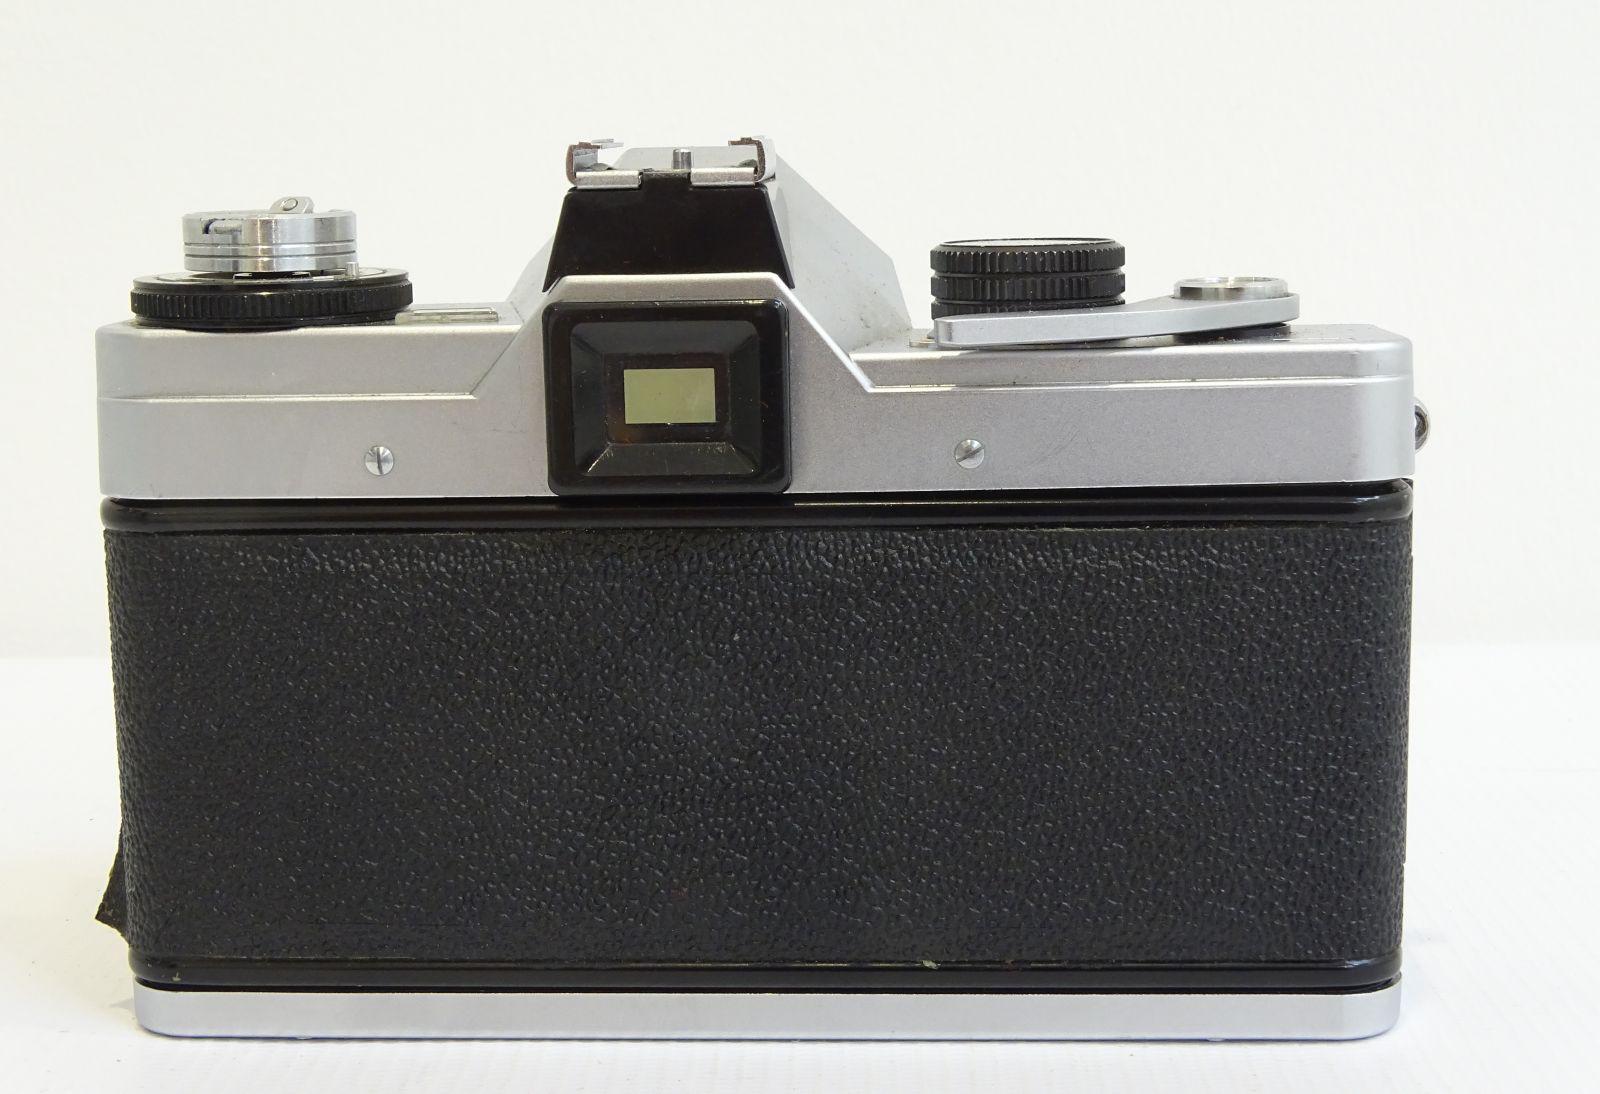 DSC00688.JPG (1600�1094)